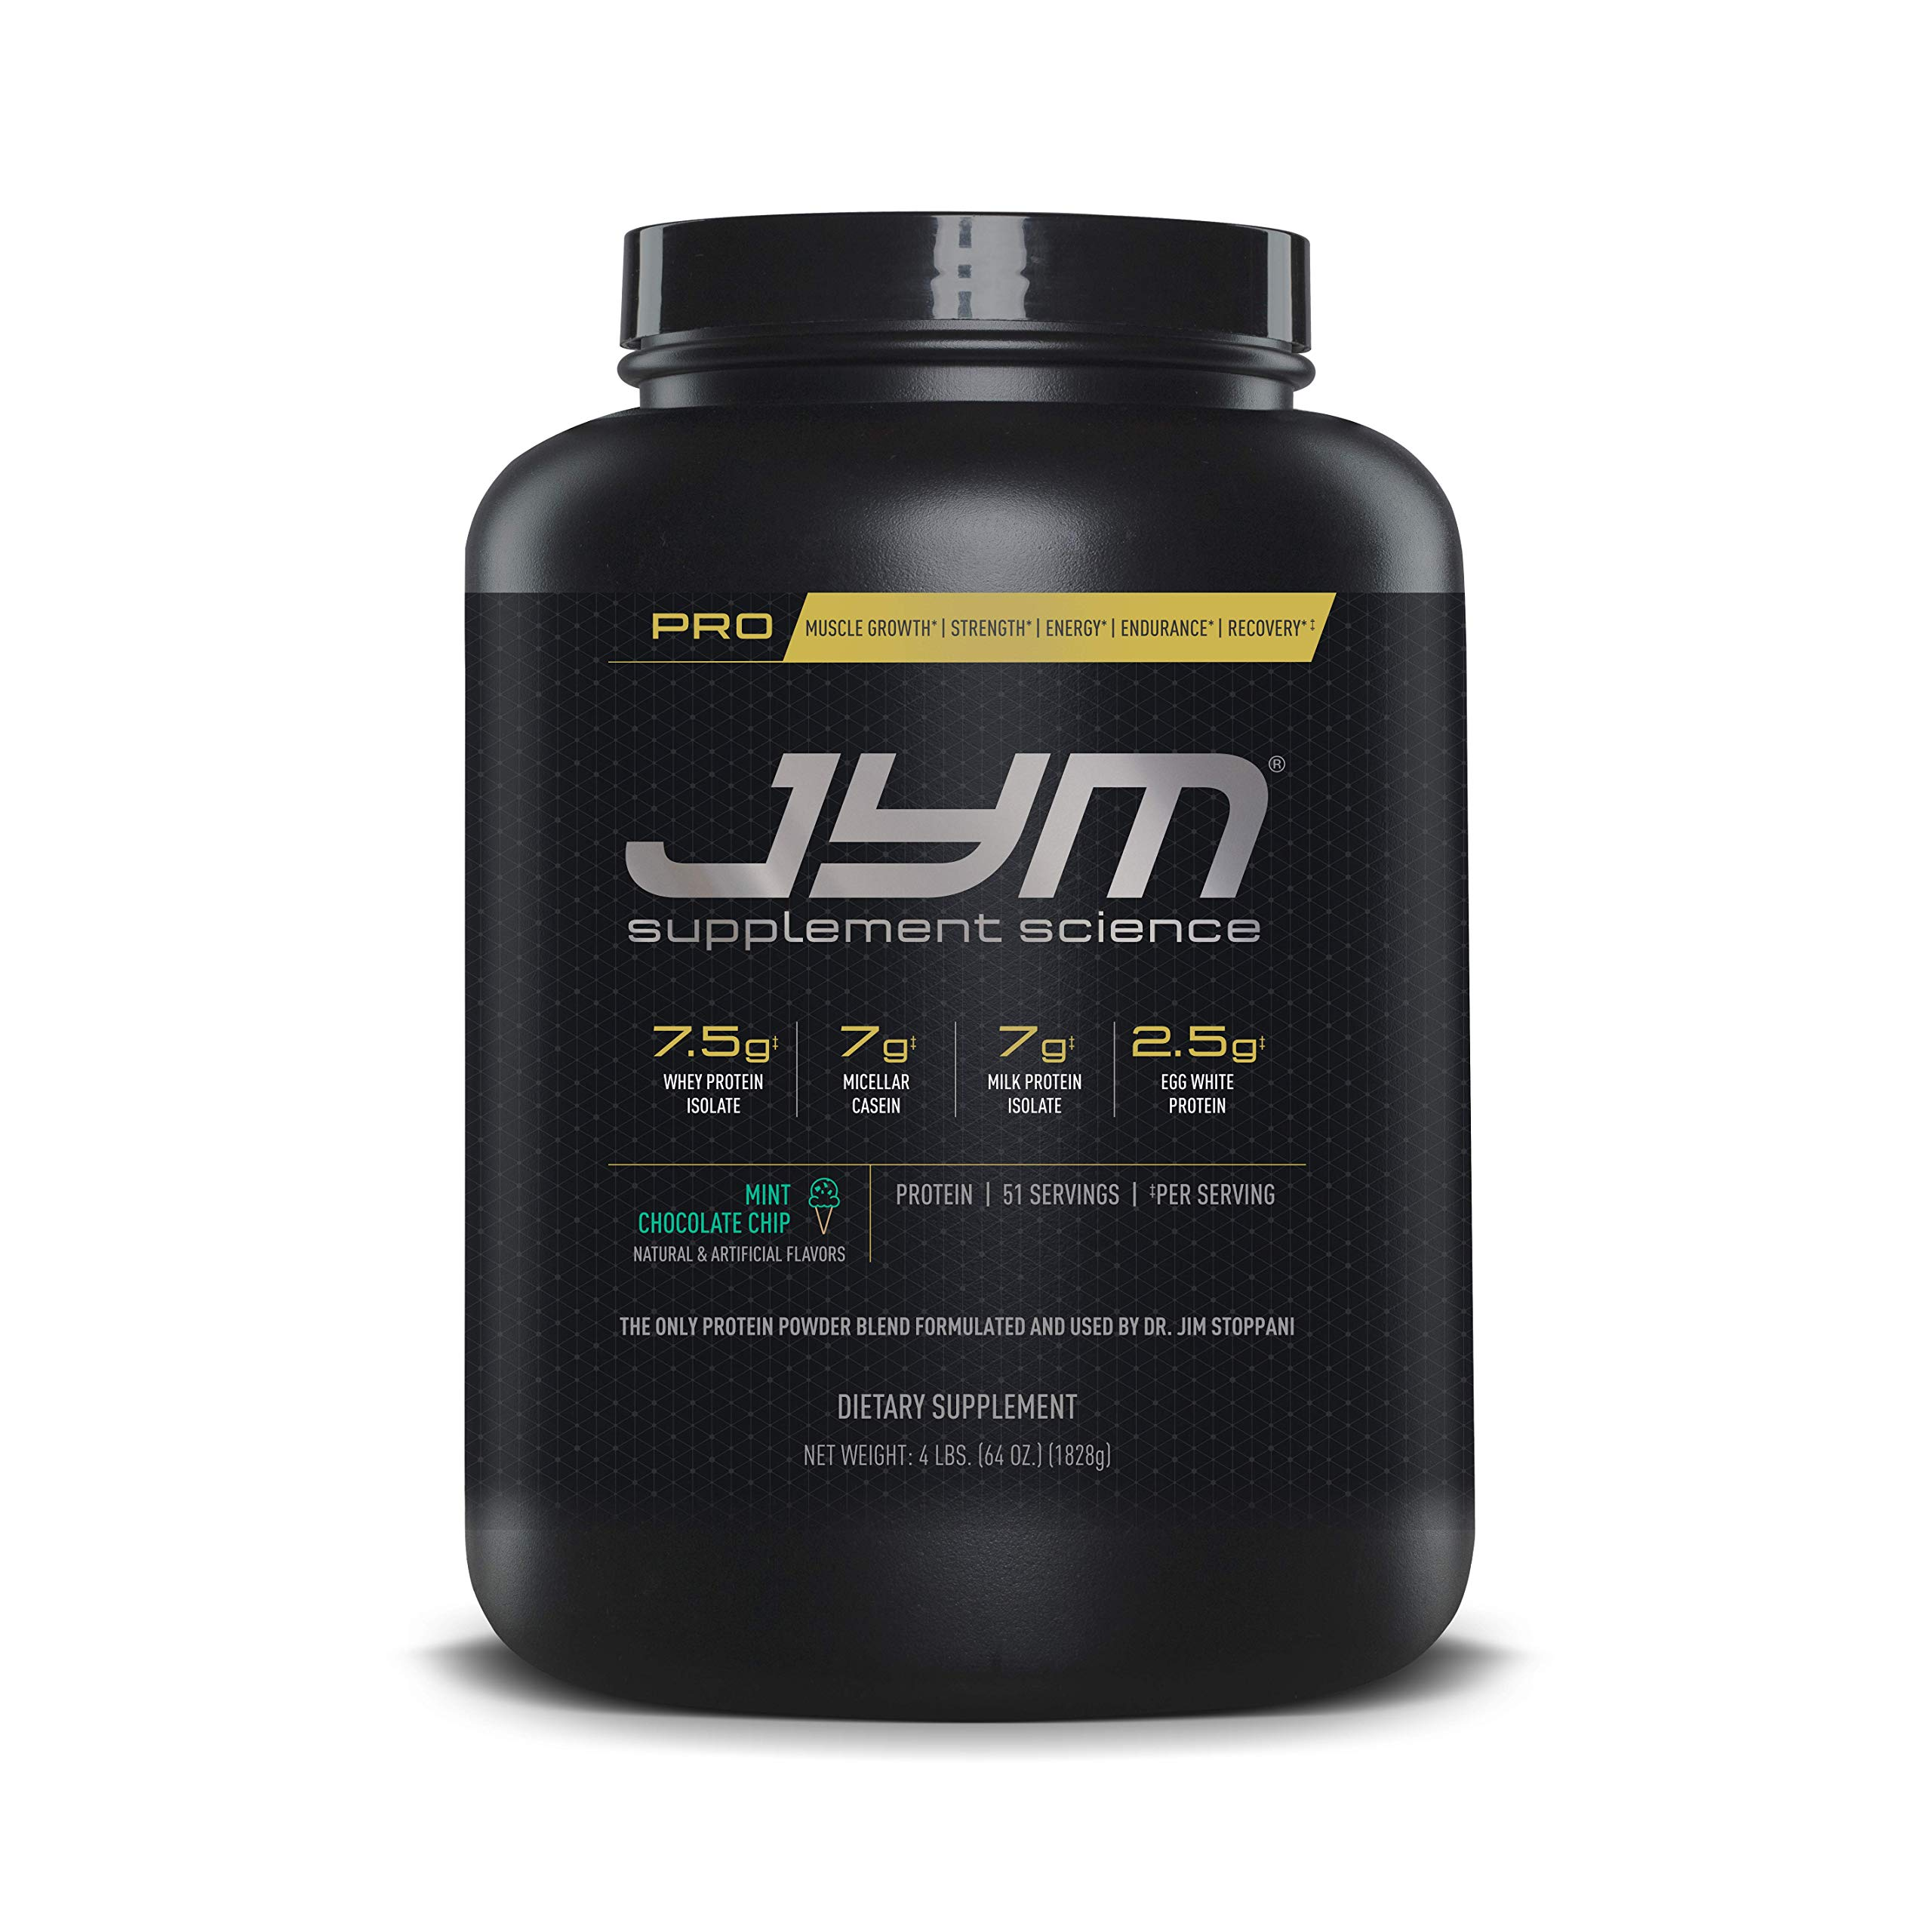 Pro Jym Protein Powder - Egg White, Milk, Whey protein isolates & Micellar Casein | JYM Supplement Science | Mint Chocolate Chip Flavor, 4 Lb by JYM Supplement Science